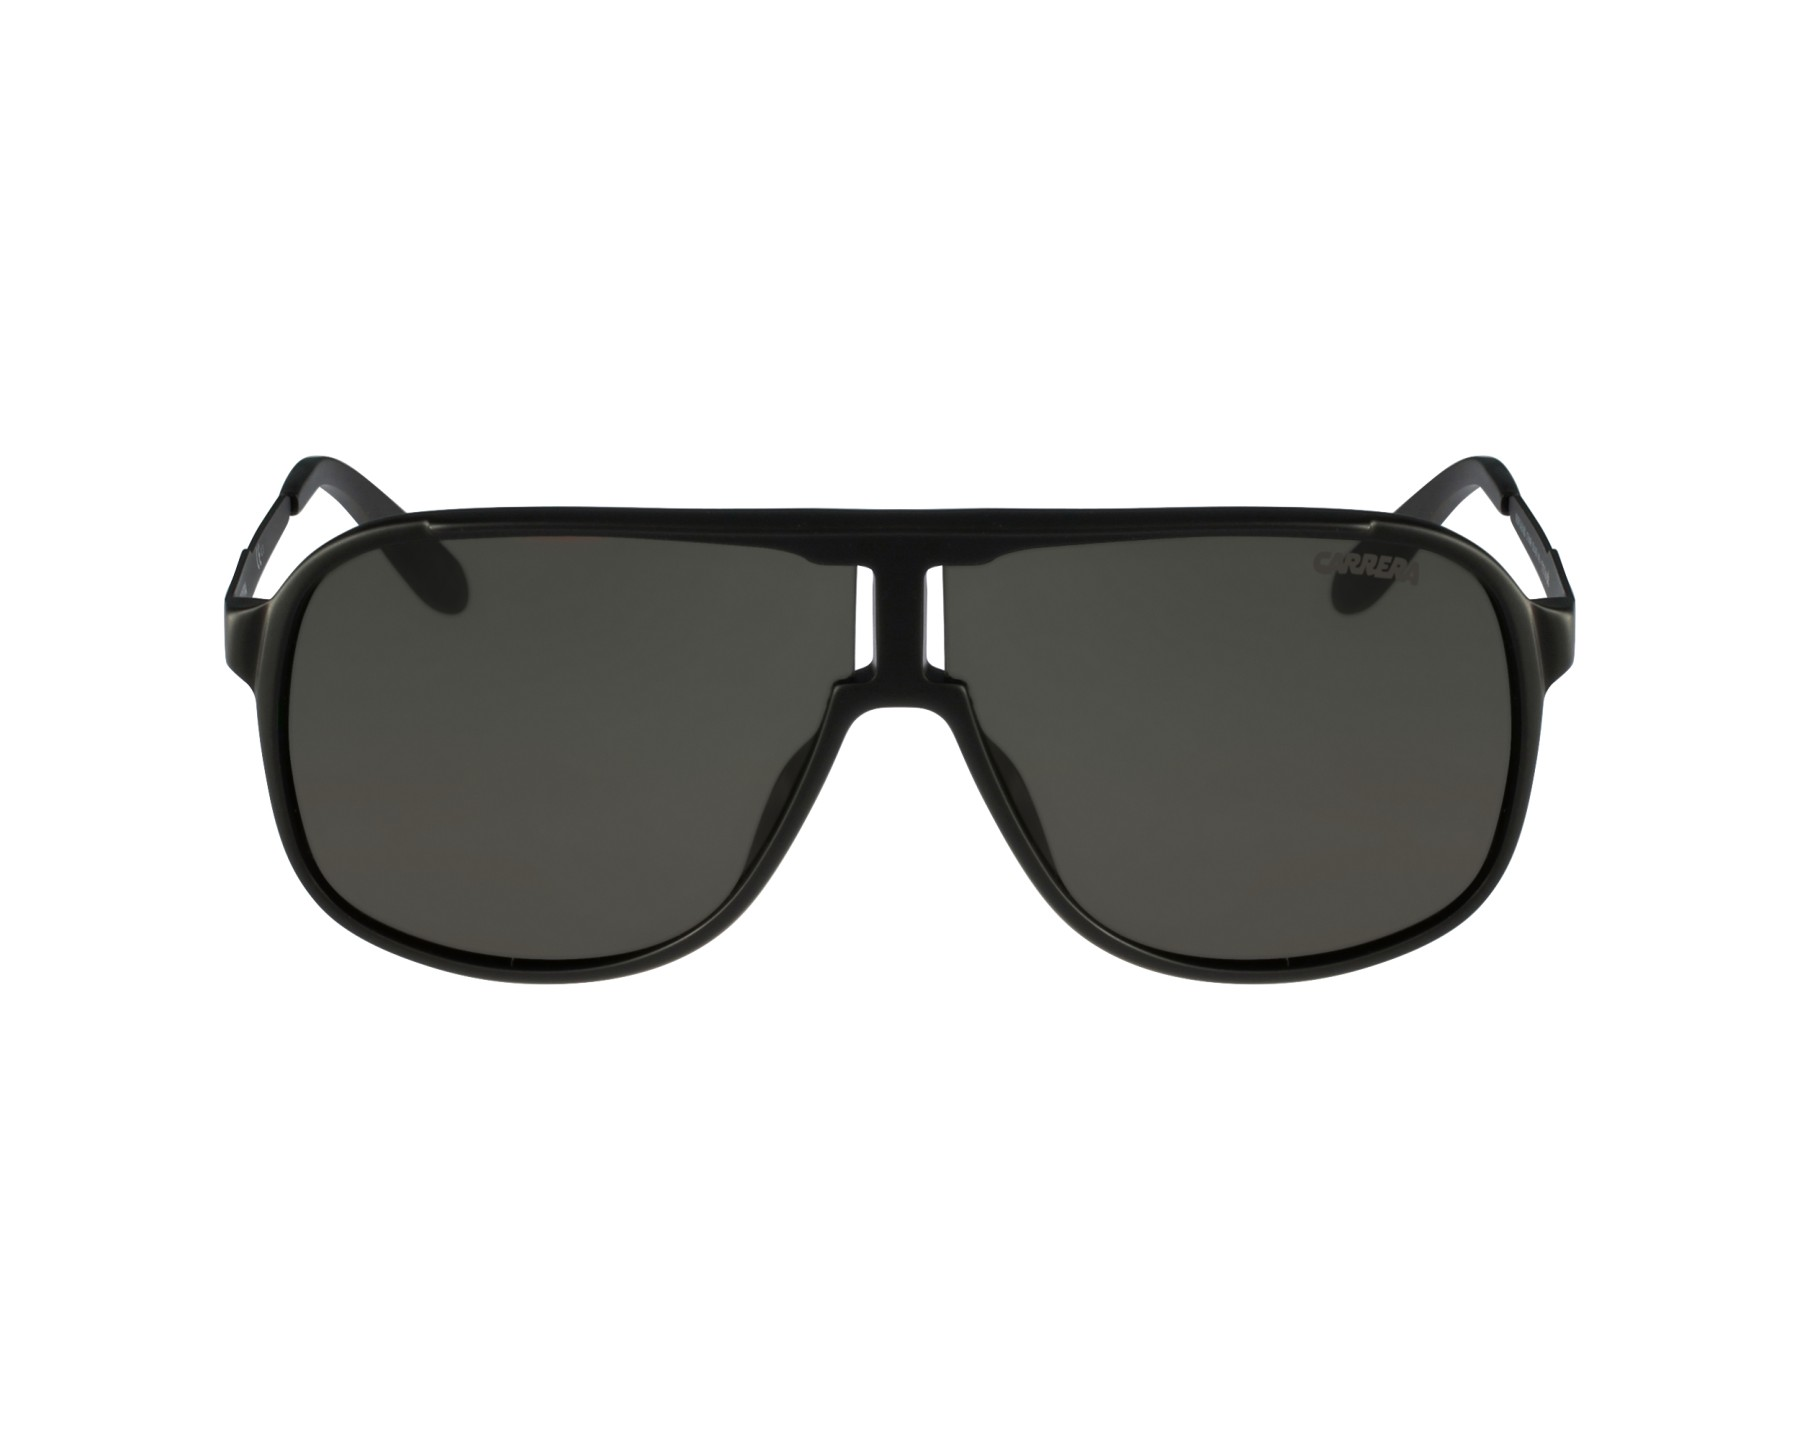 95ebc8c5ffd Sunglasses carrera new safari black profile view jpg 1800x1440 Carrera  safari men